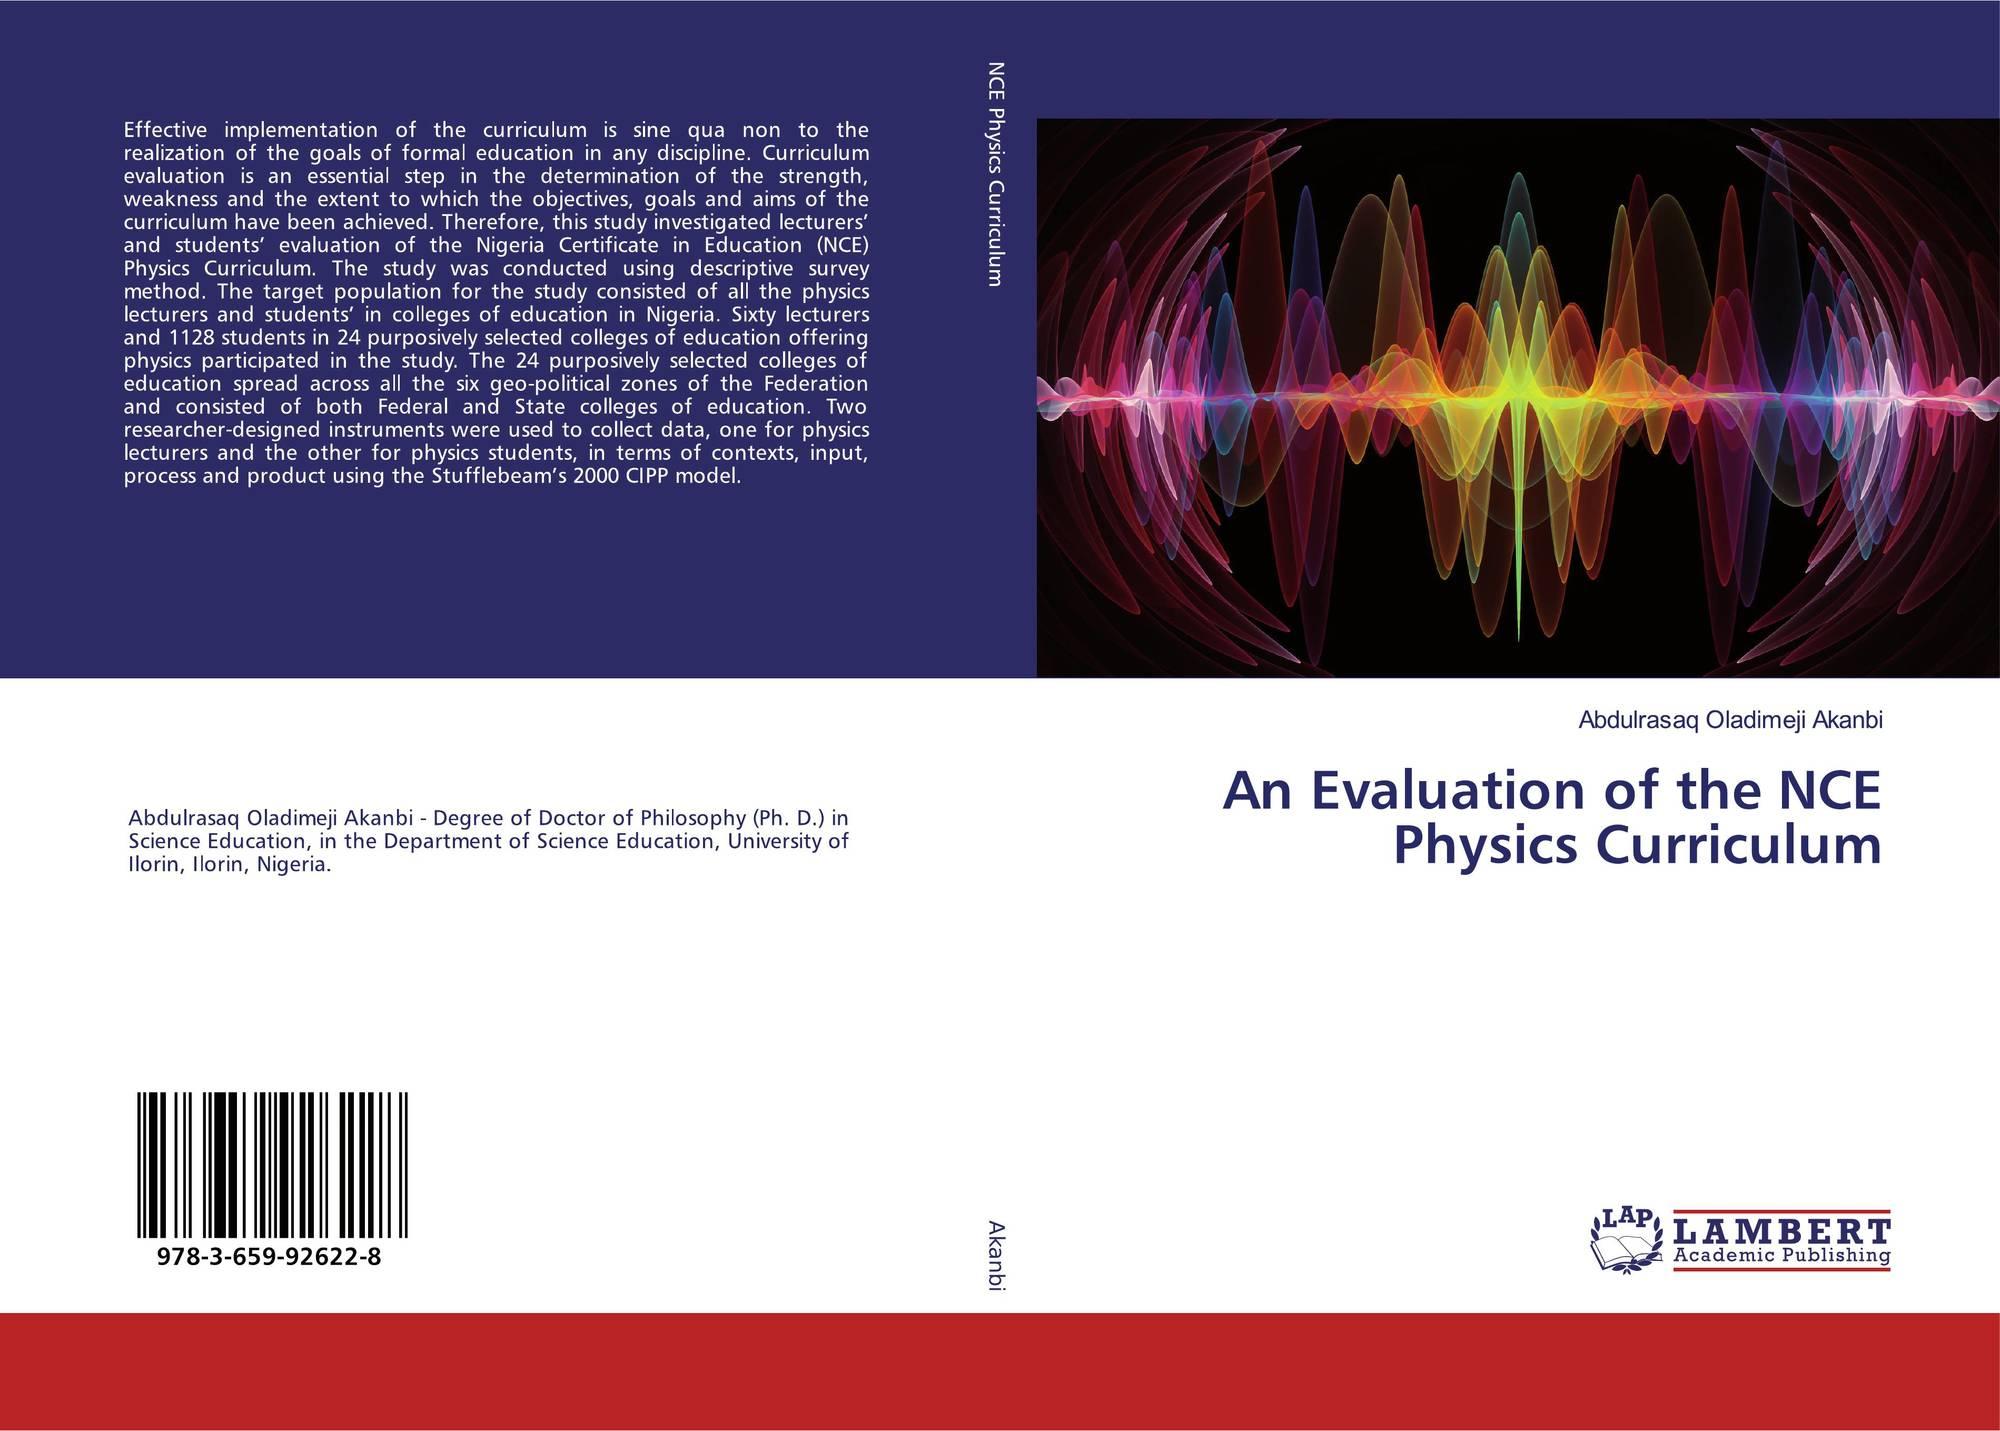 An Evaluation of the NCE Physics Curriculum, 978-3-659-92622-8, 3659926221  ,9783659926228 by Abdulrasaq Oladimeji Akanbi